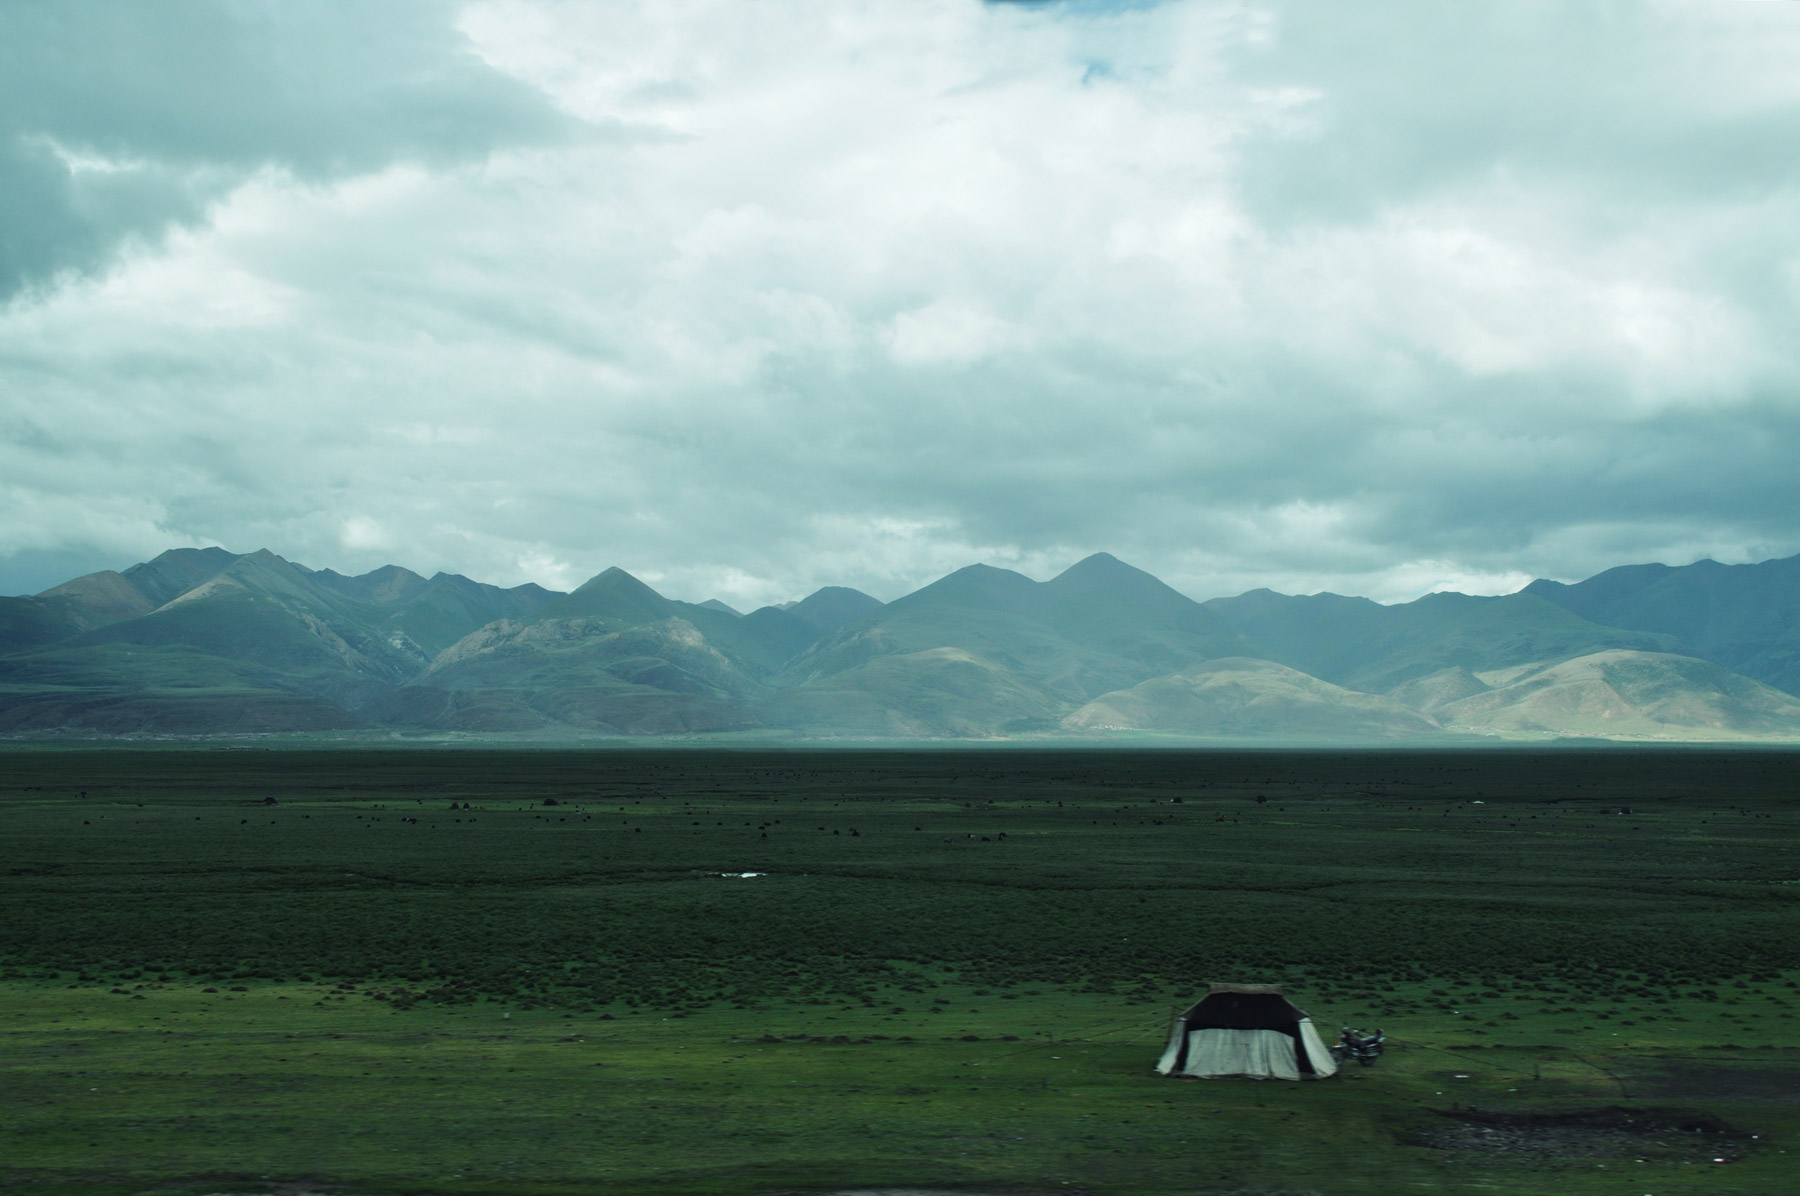 Nomad Tent, Tibet